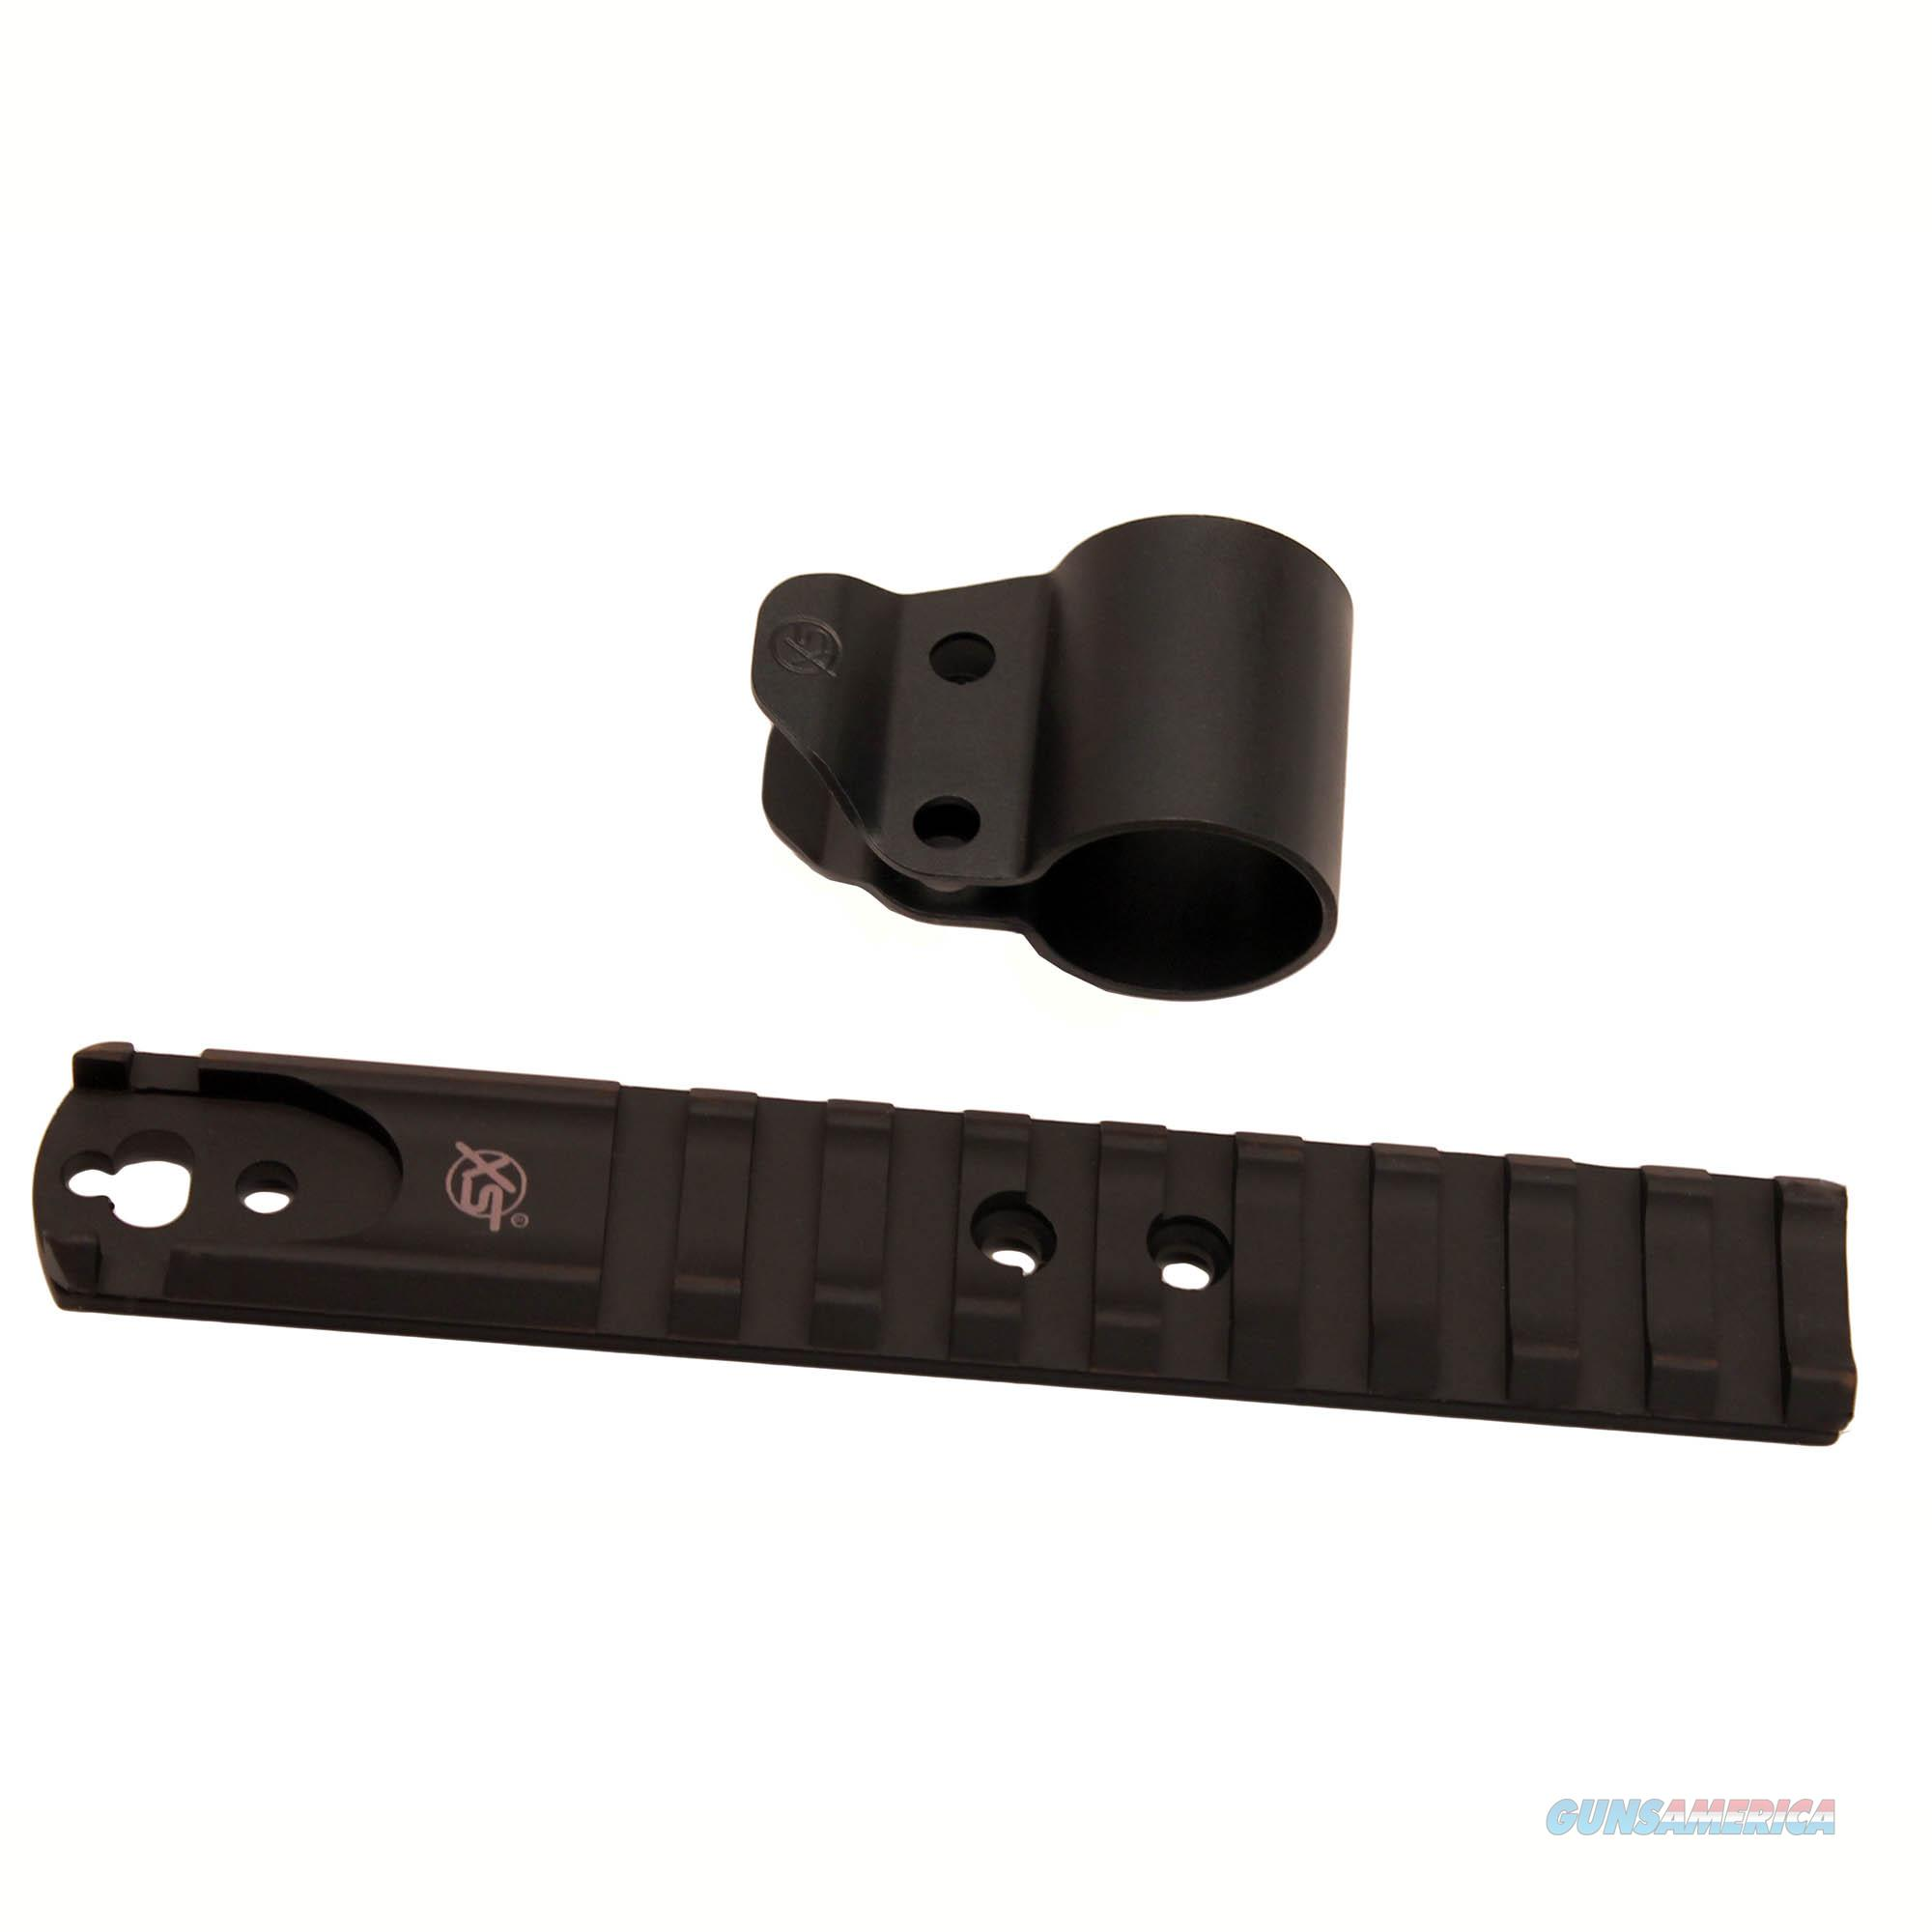 Xs Sights Shotrail MB-4001R-4  Non-Guns > Iron/Metal/Peep Sights